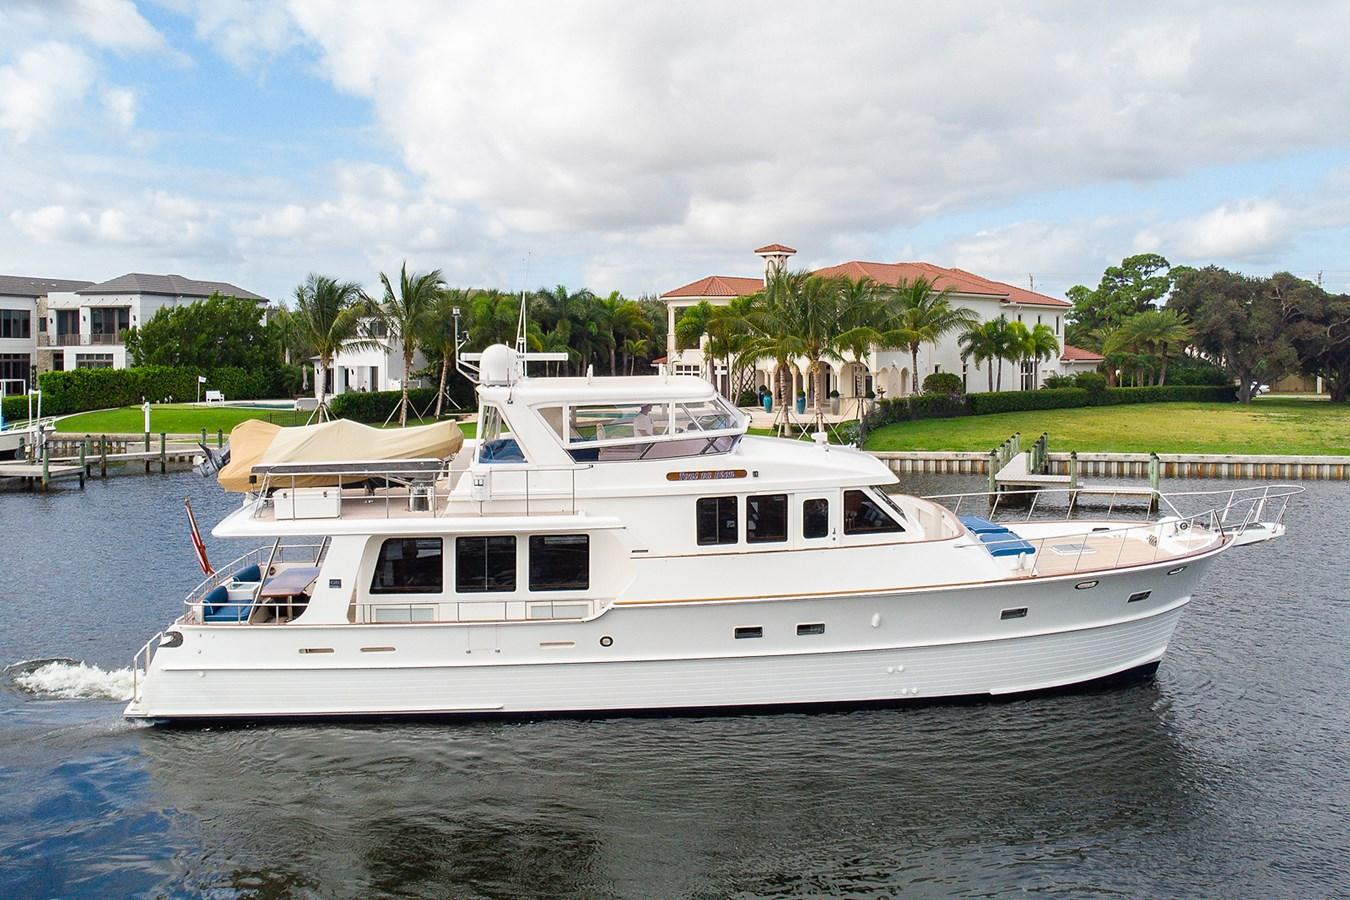 Tout Va BienDJI_0116 2005 GRAND BANKS 64 Aleutian RP Motor Yacht 2726176